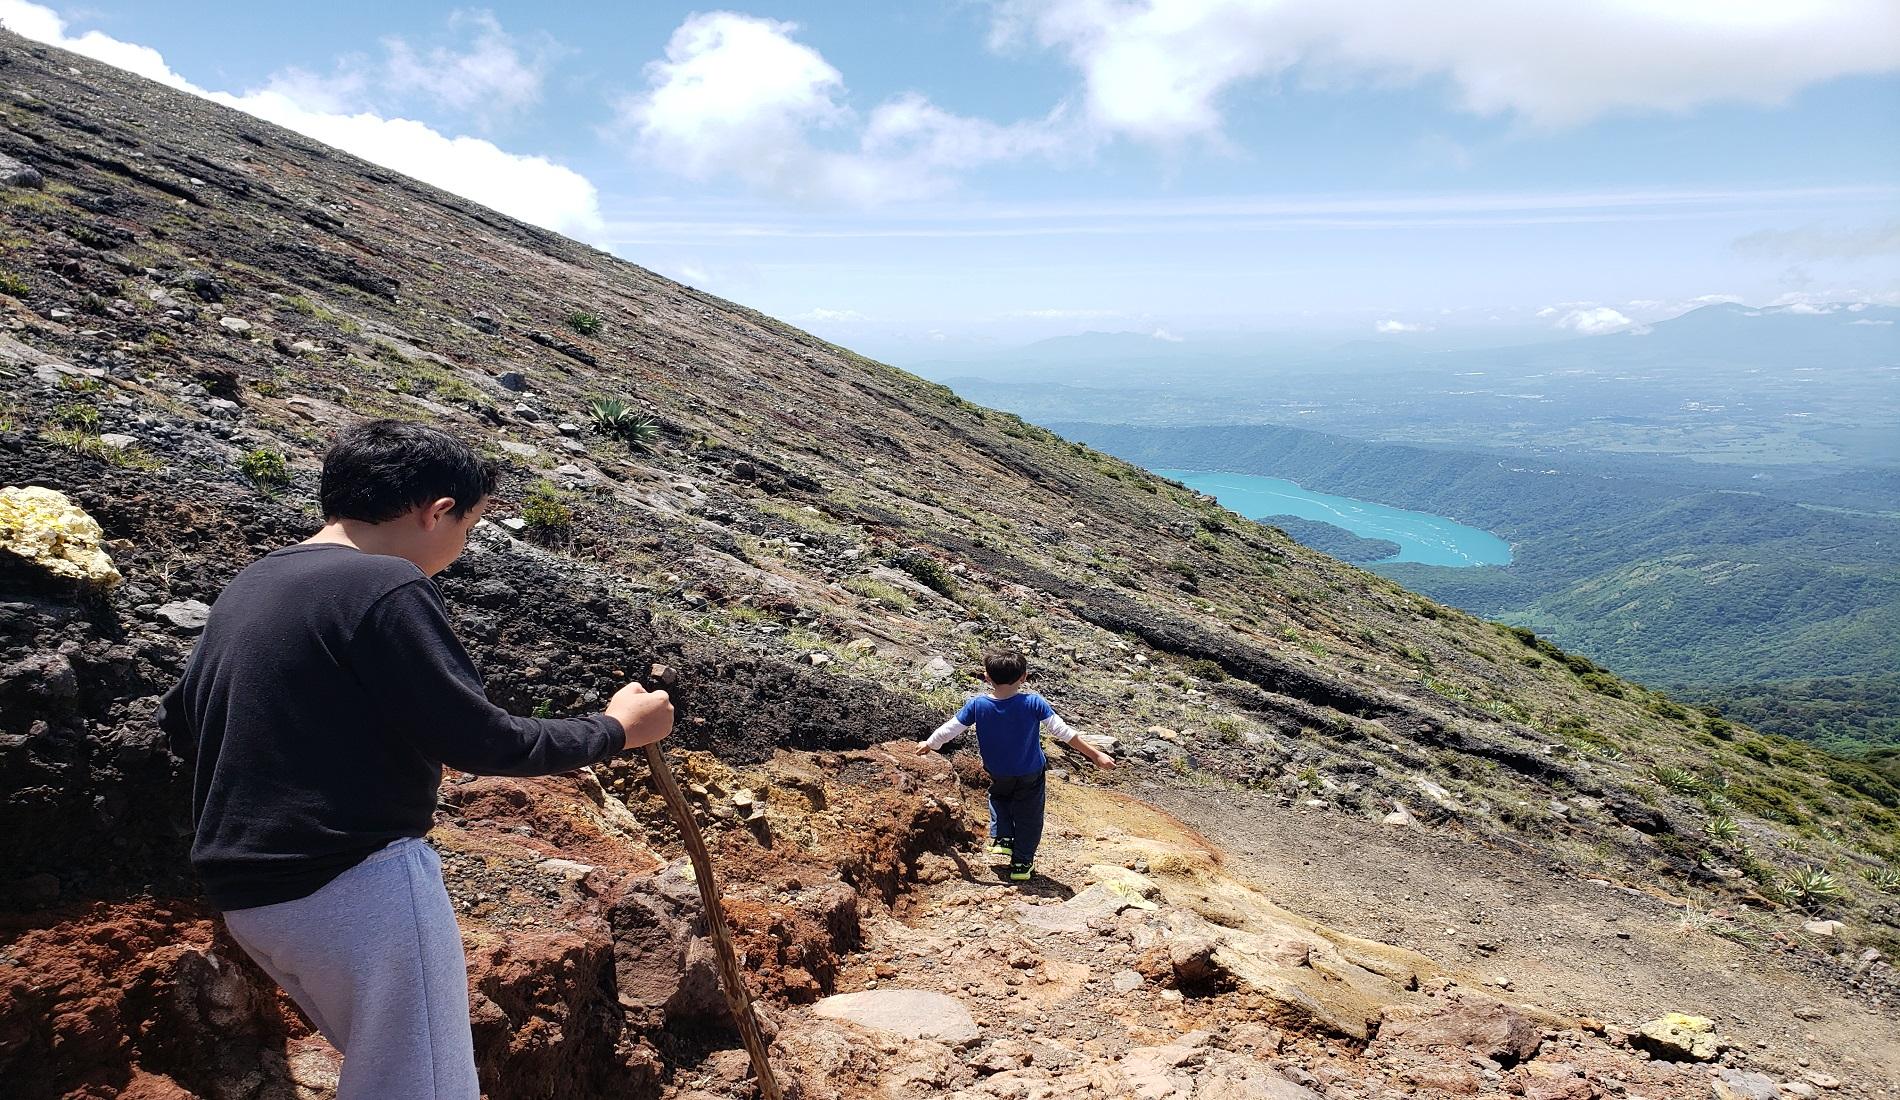 santa ana vulkaan beklimmen